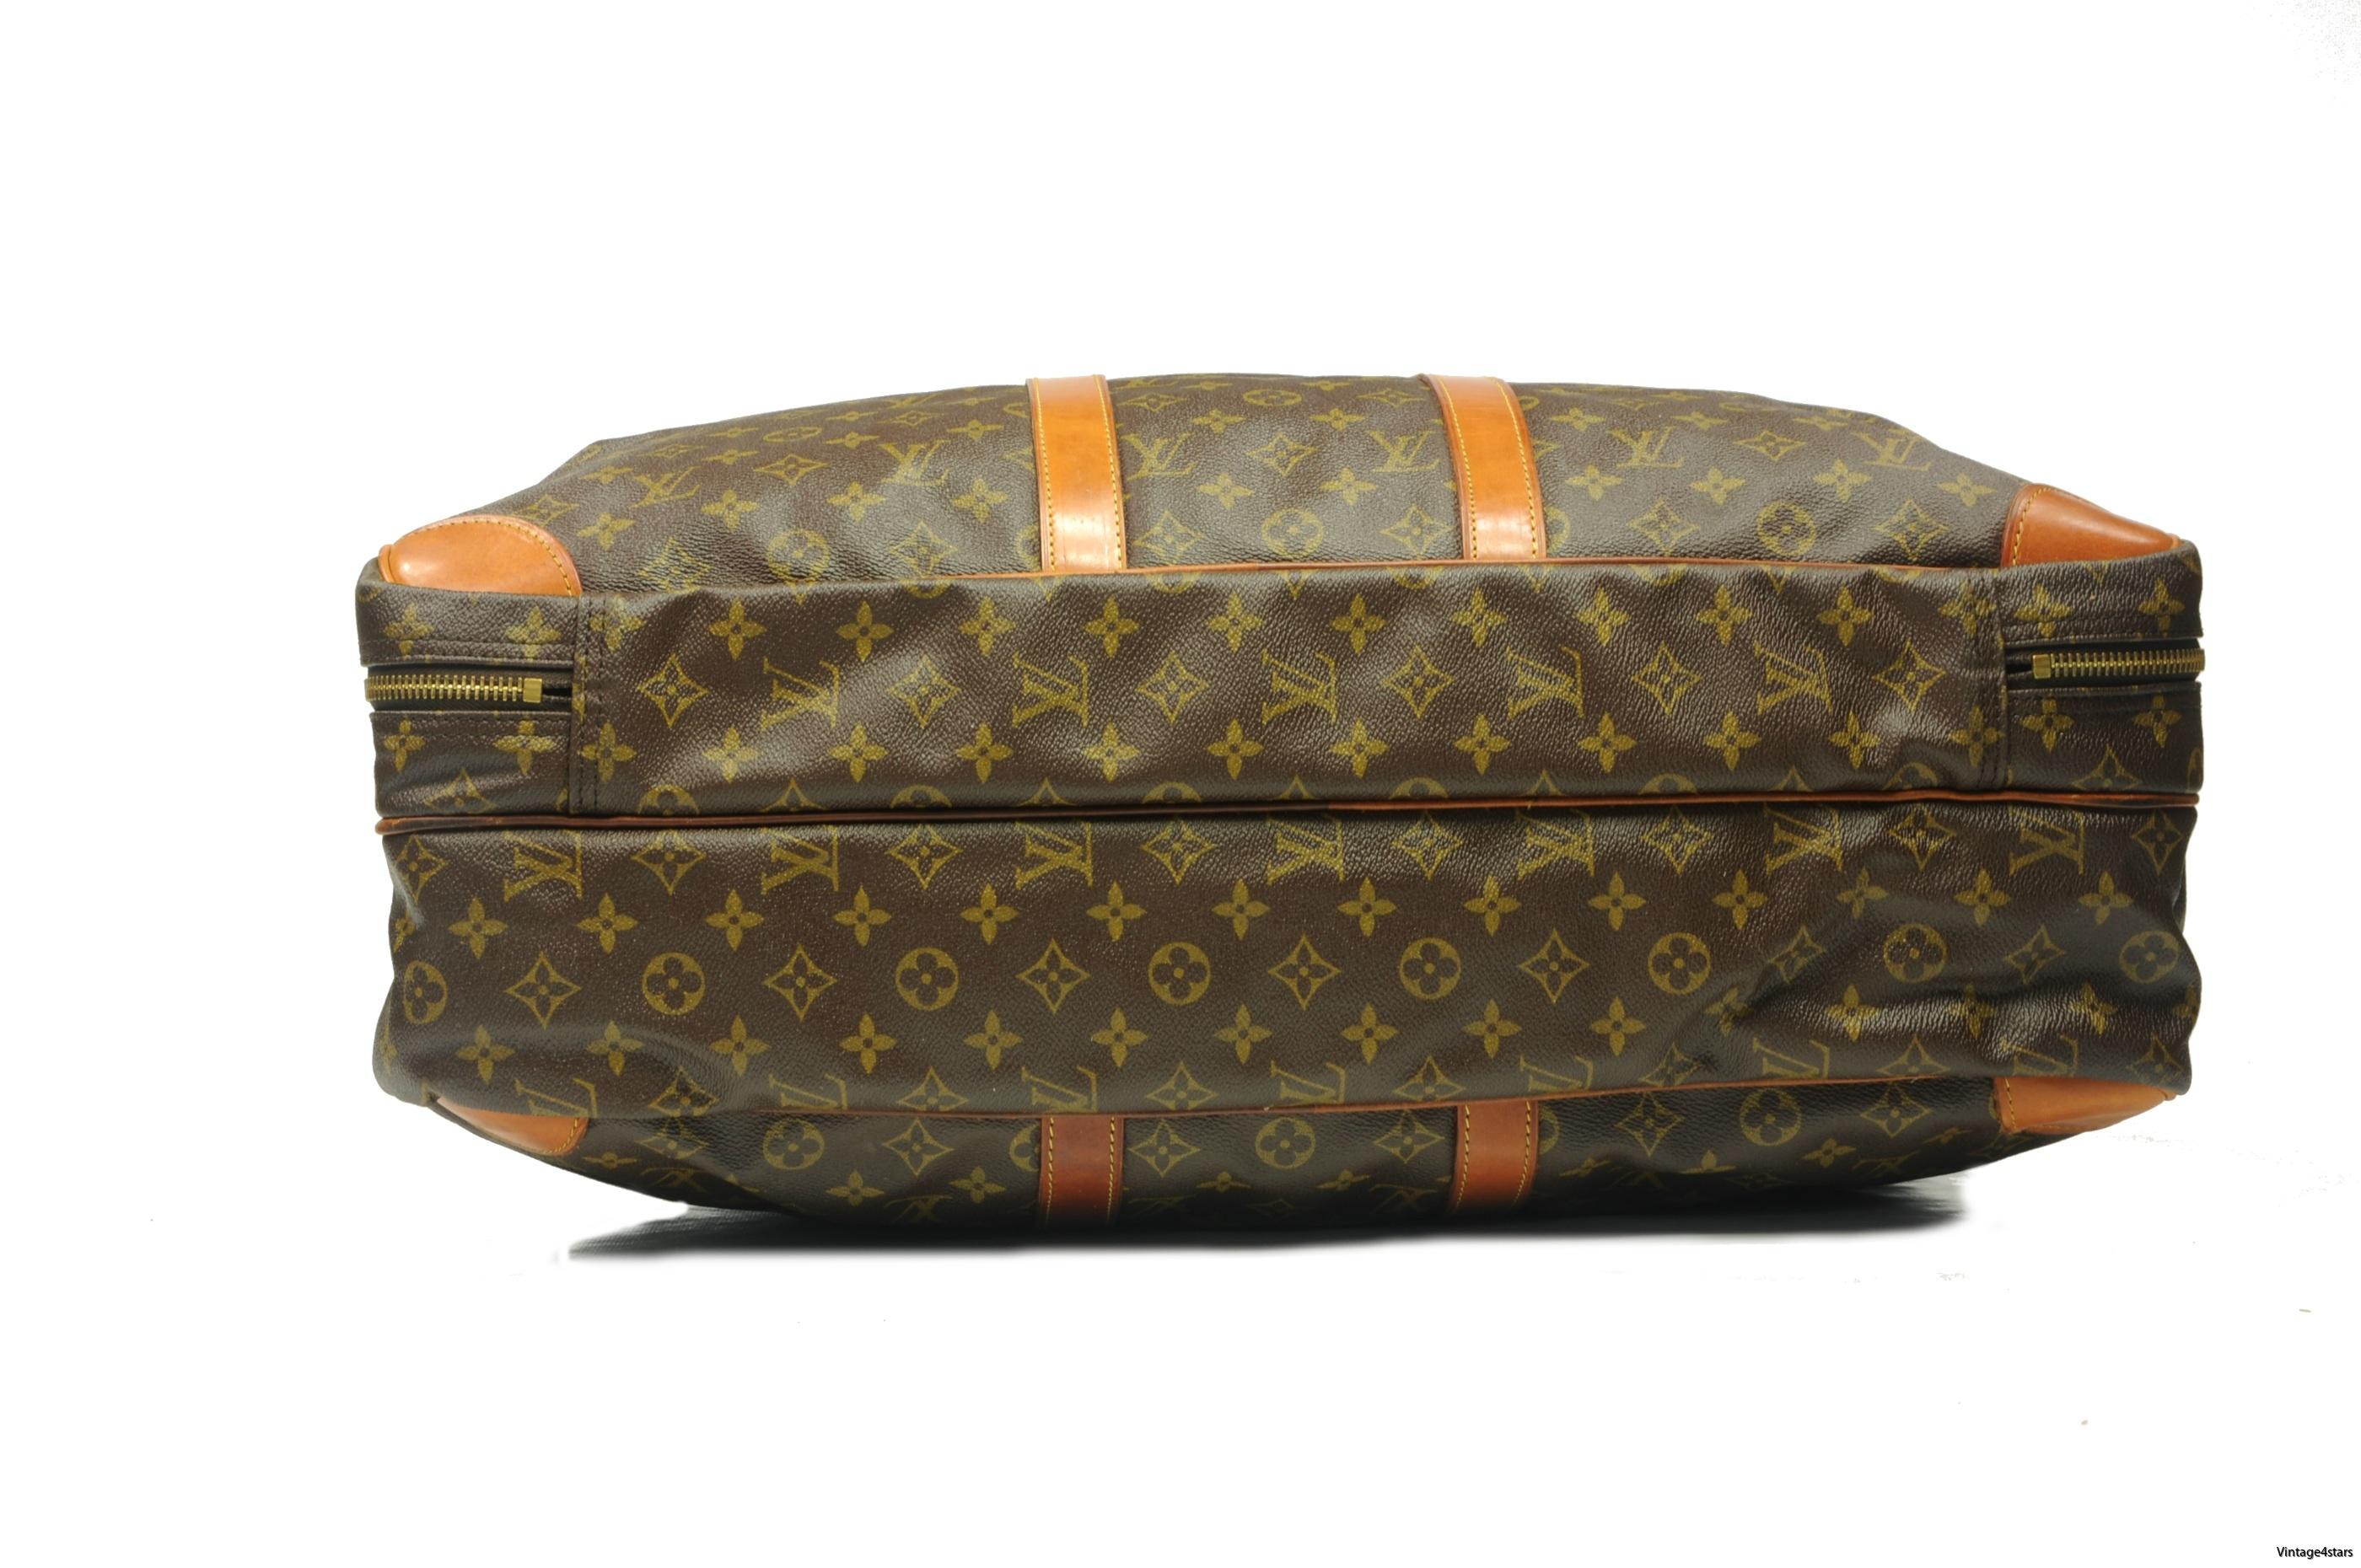 Louis Vuitton Sac 48 Heures 04